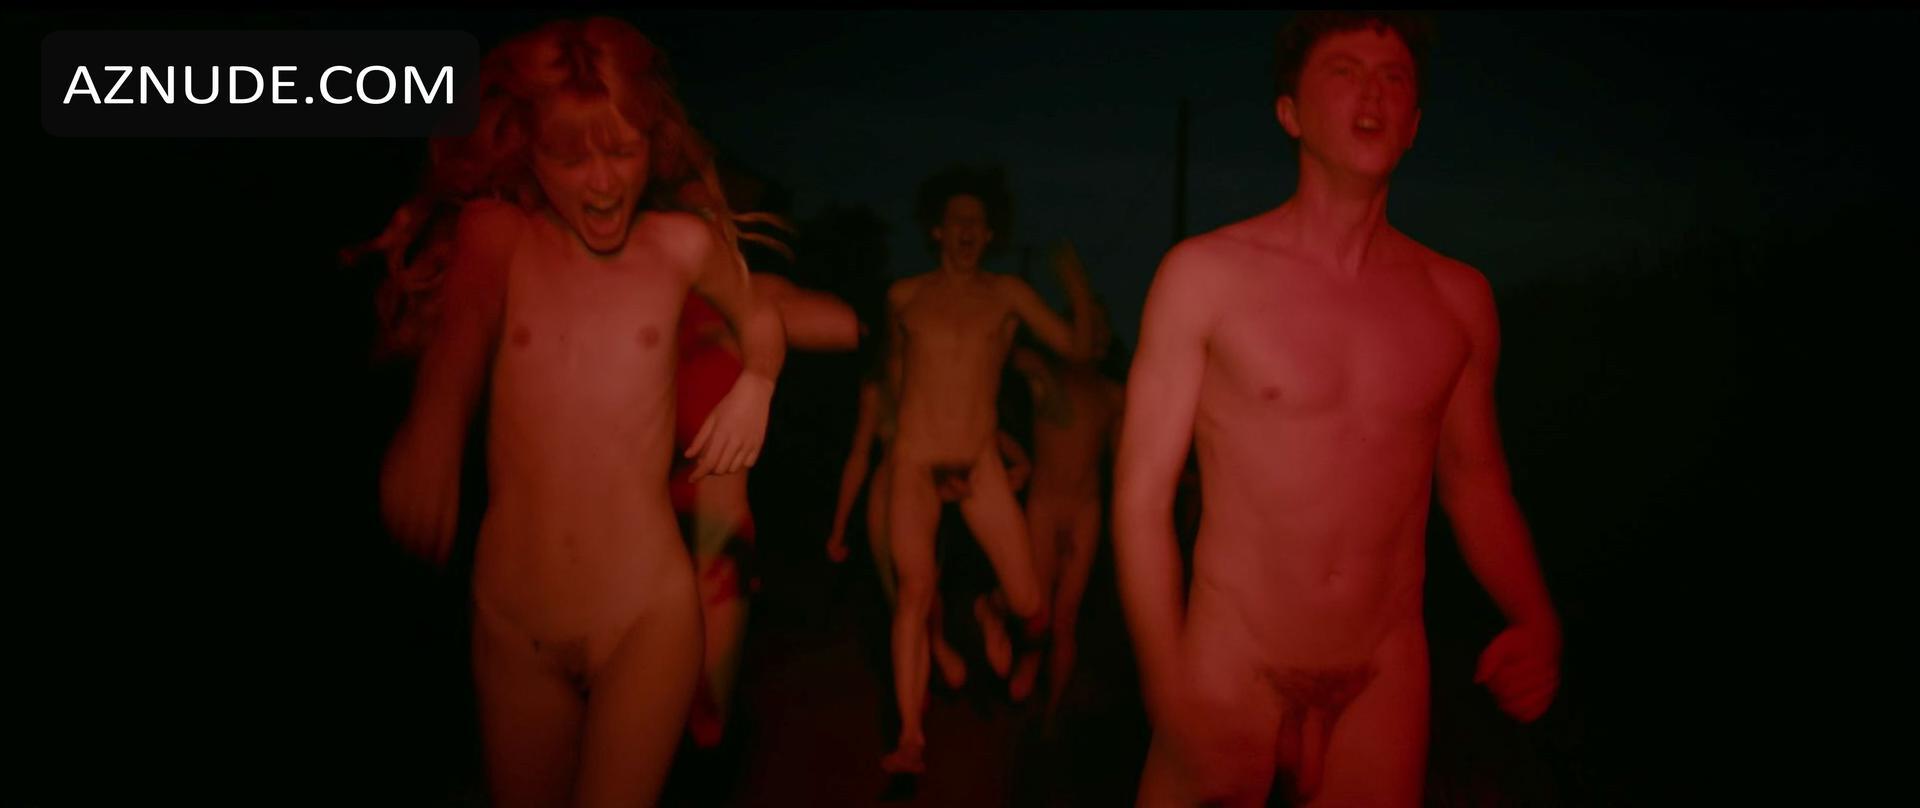 Sex street gang video pic